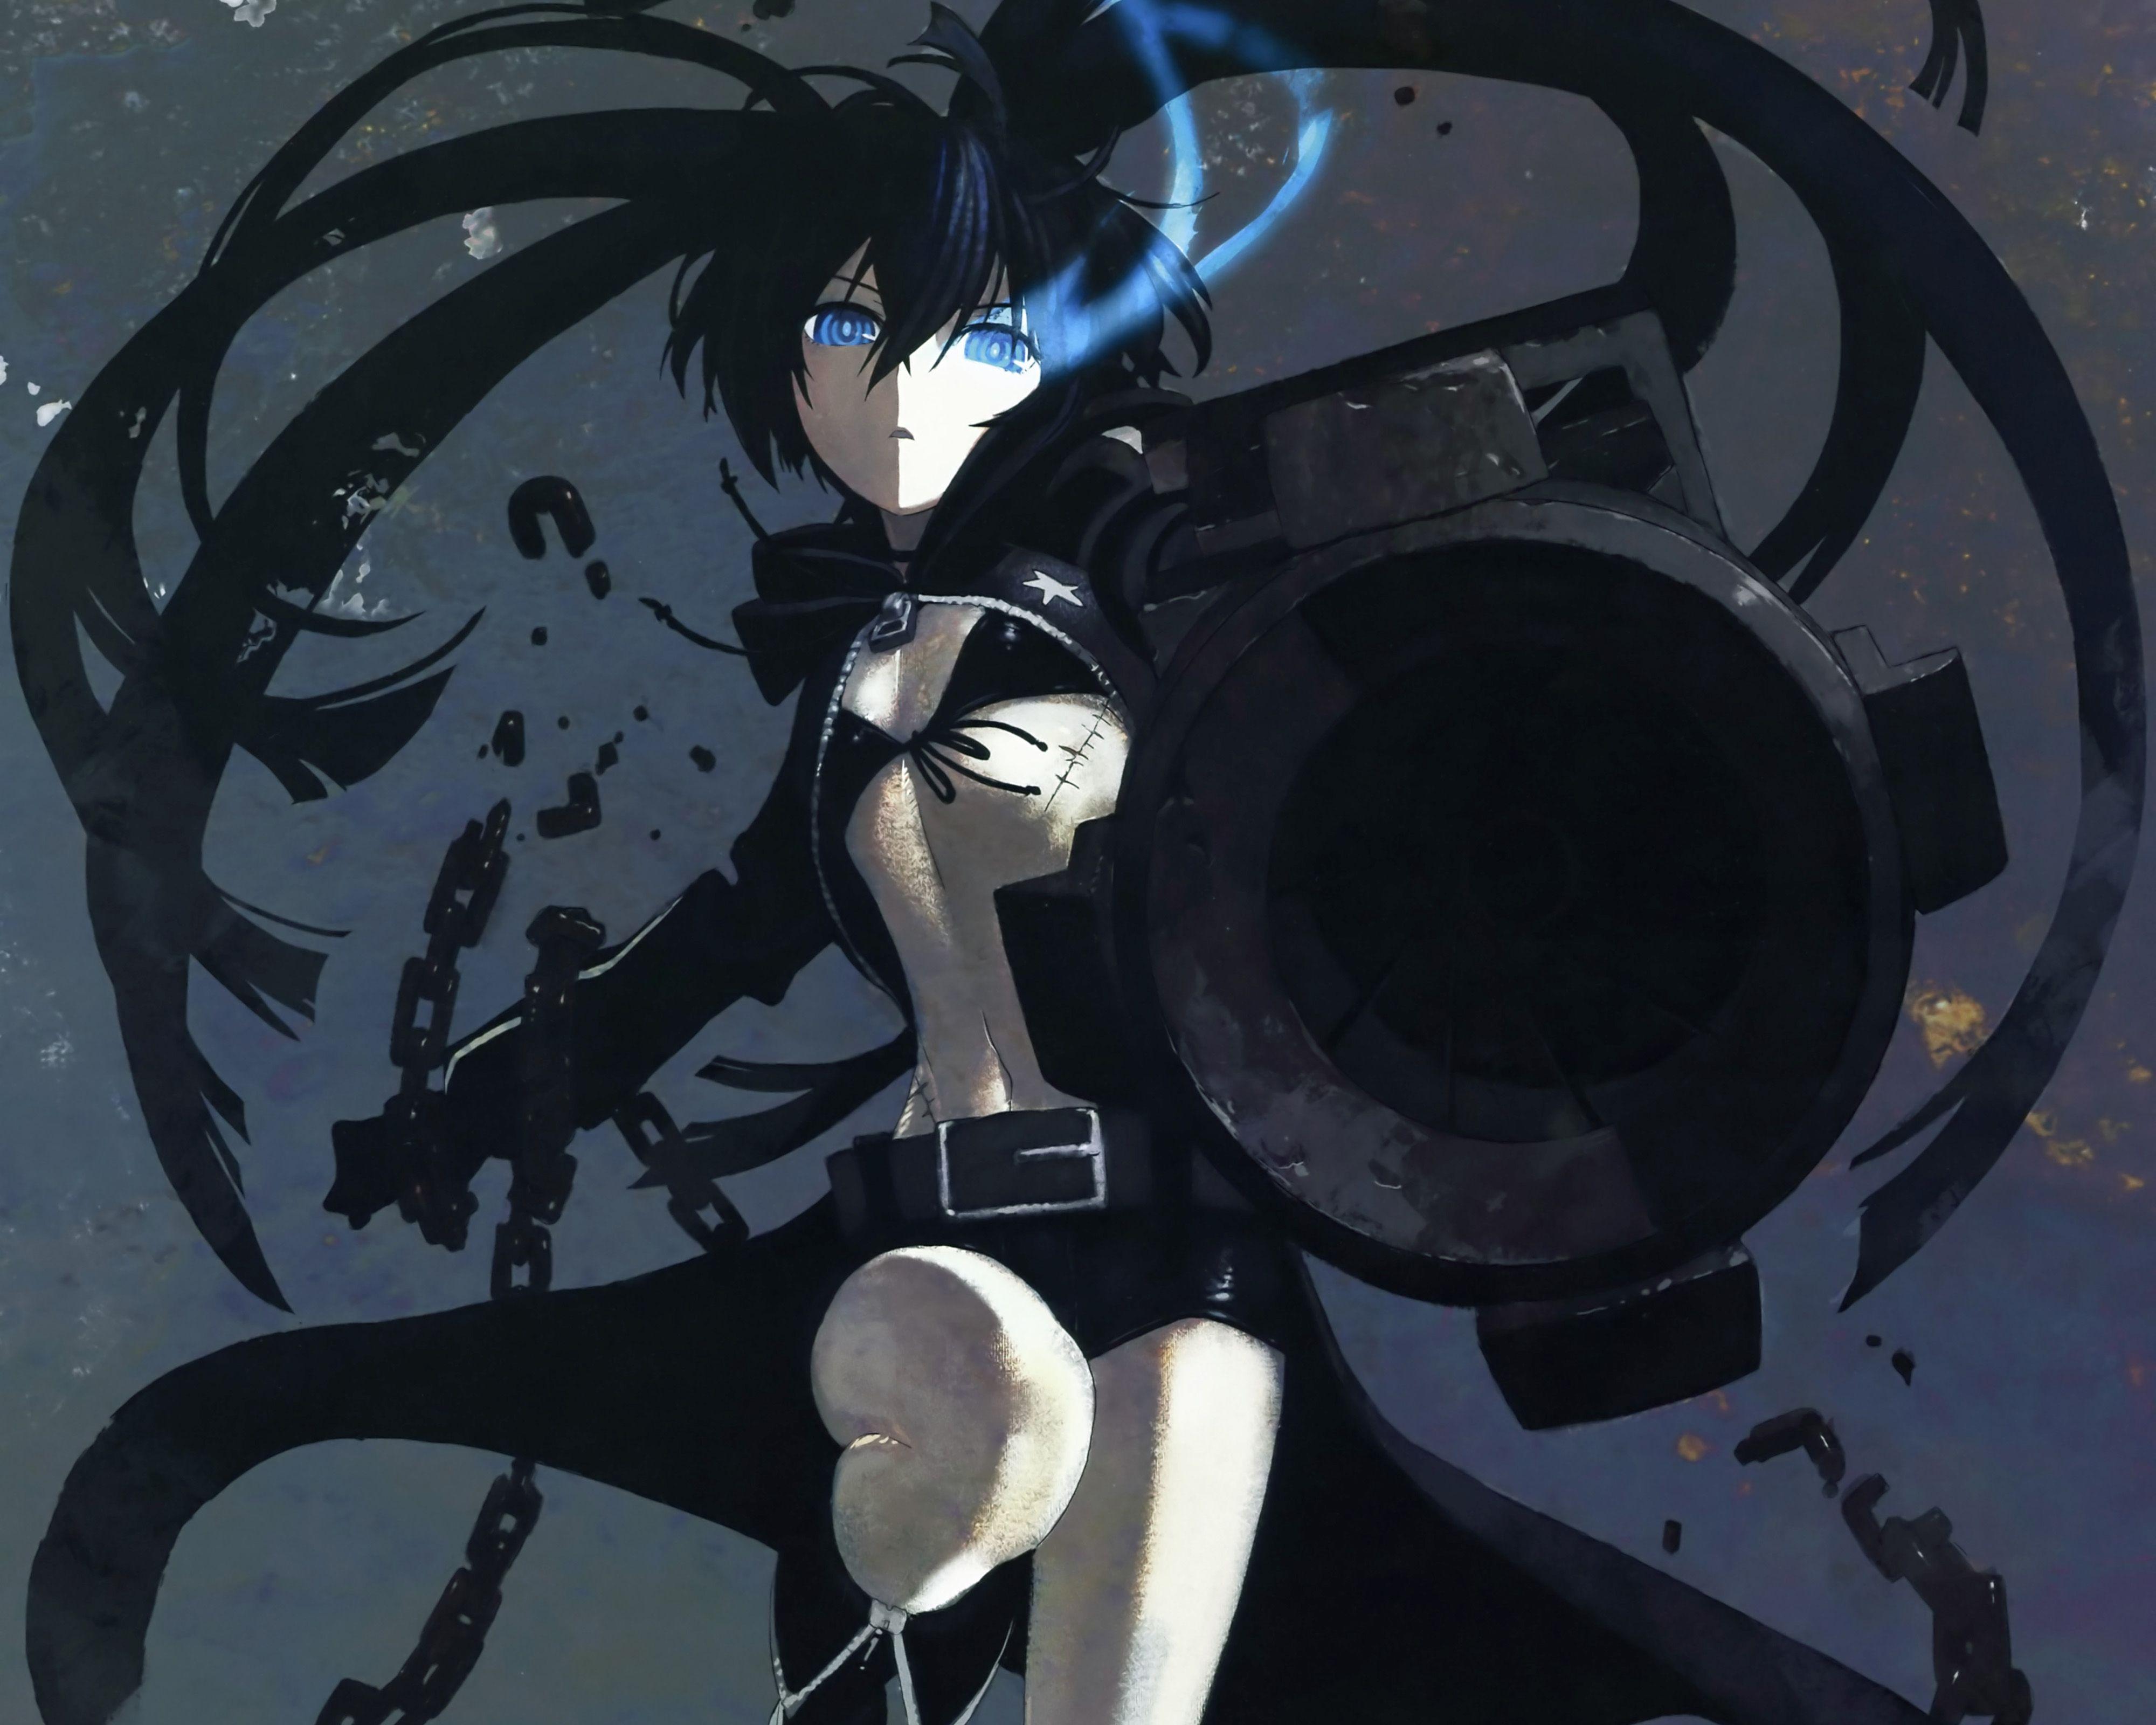 Anime Black Rock Shooter Wallpaper Black rock shooter